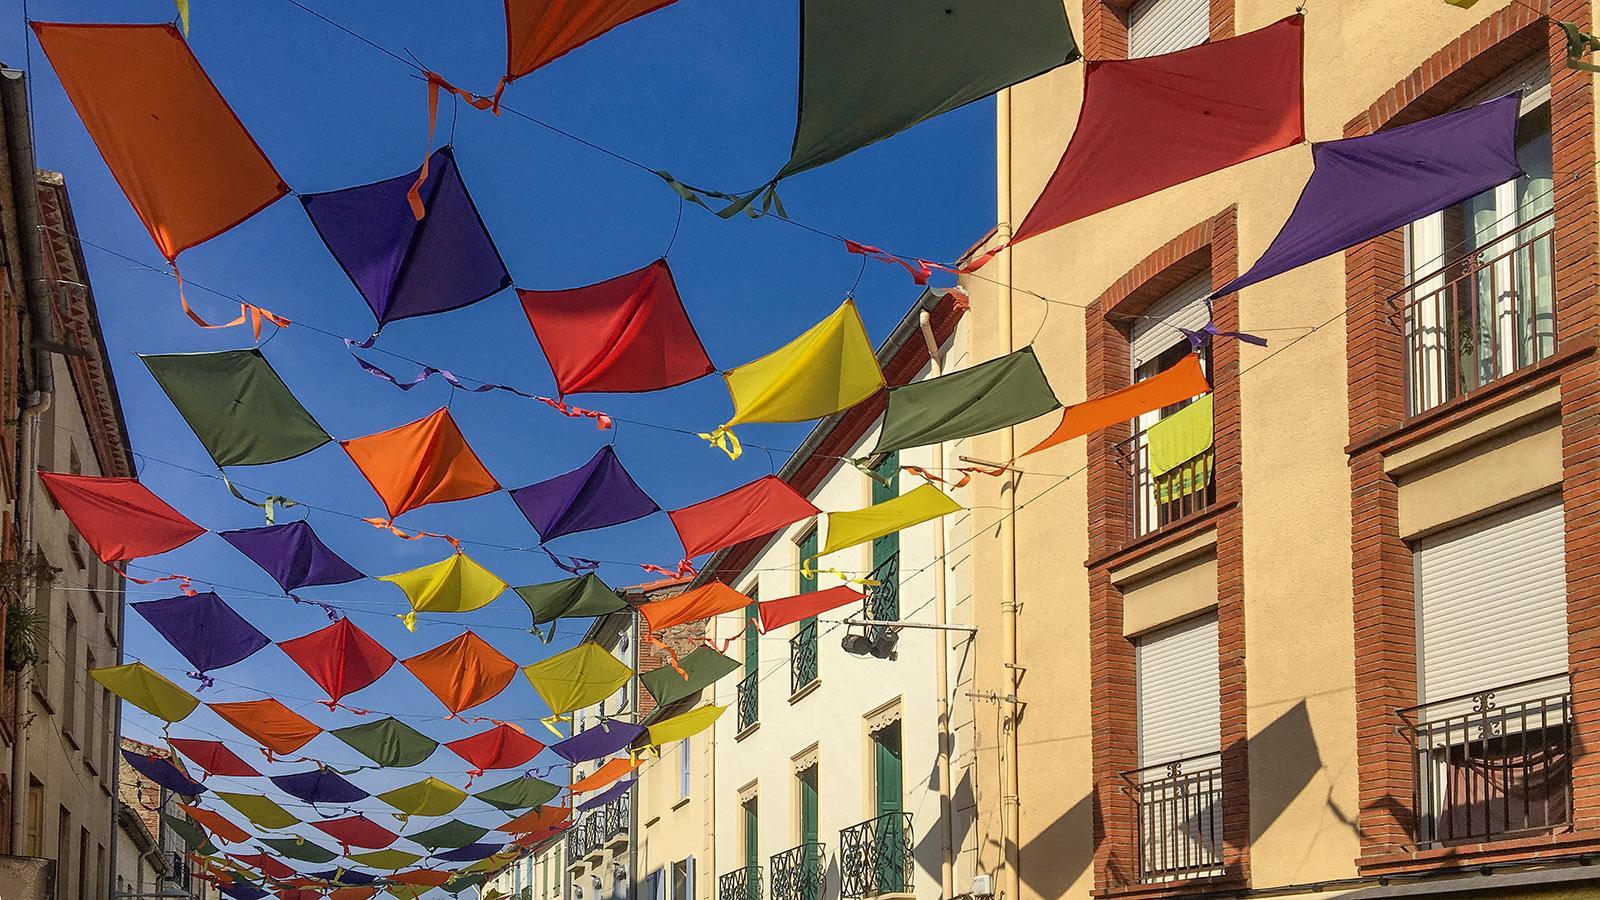 Im Sommer schützen bunte Sonnensegel diese Altstadtgasse. Foto: Hilke Maunder